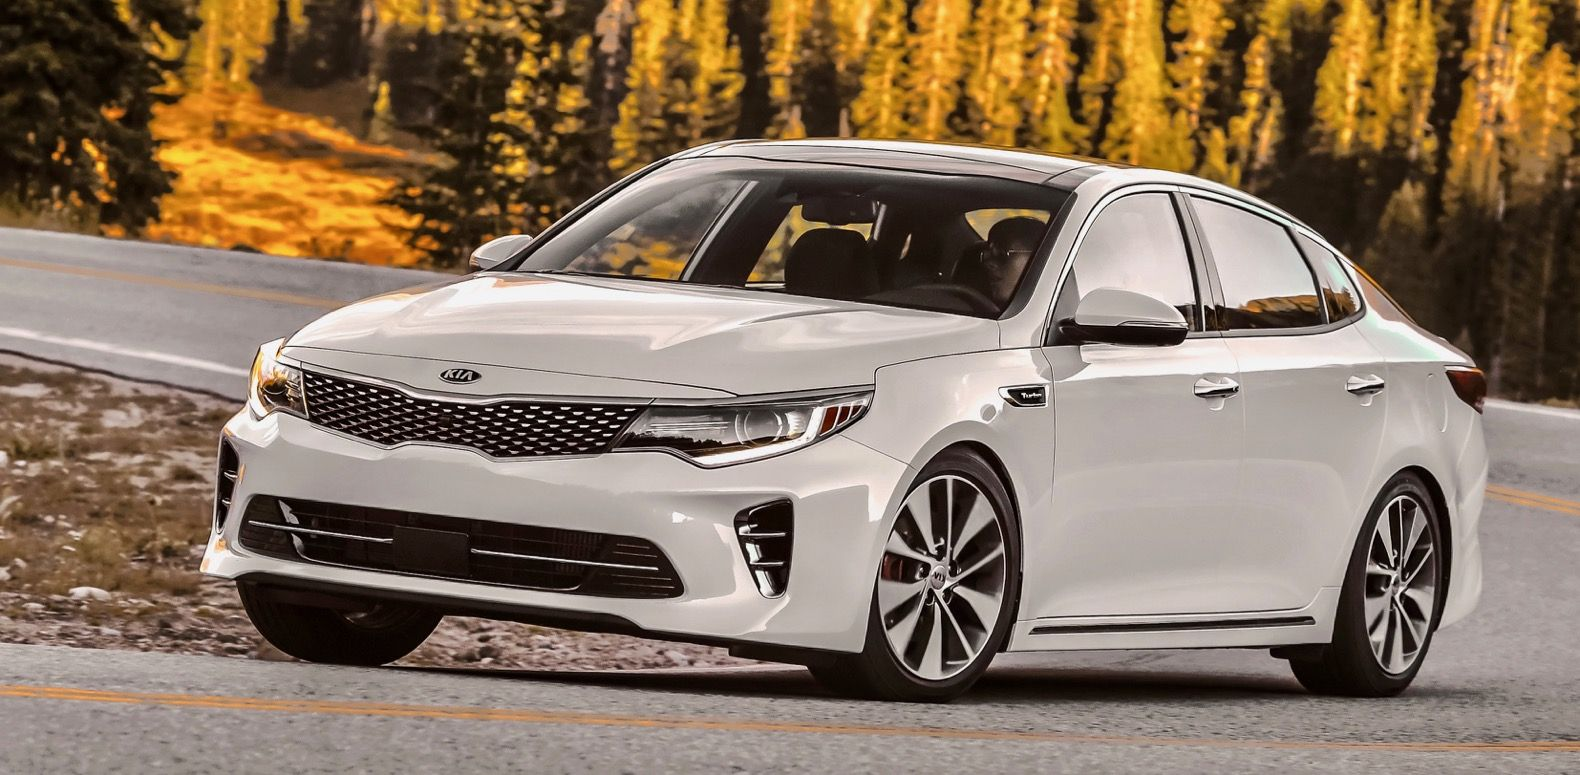 2017 kia optima Best new cars, Kia optima, Best family cars